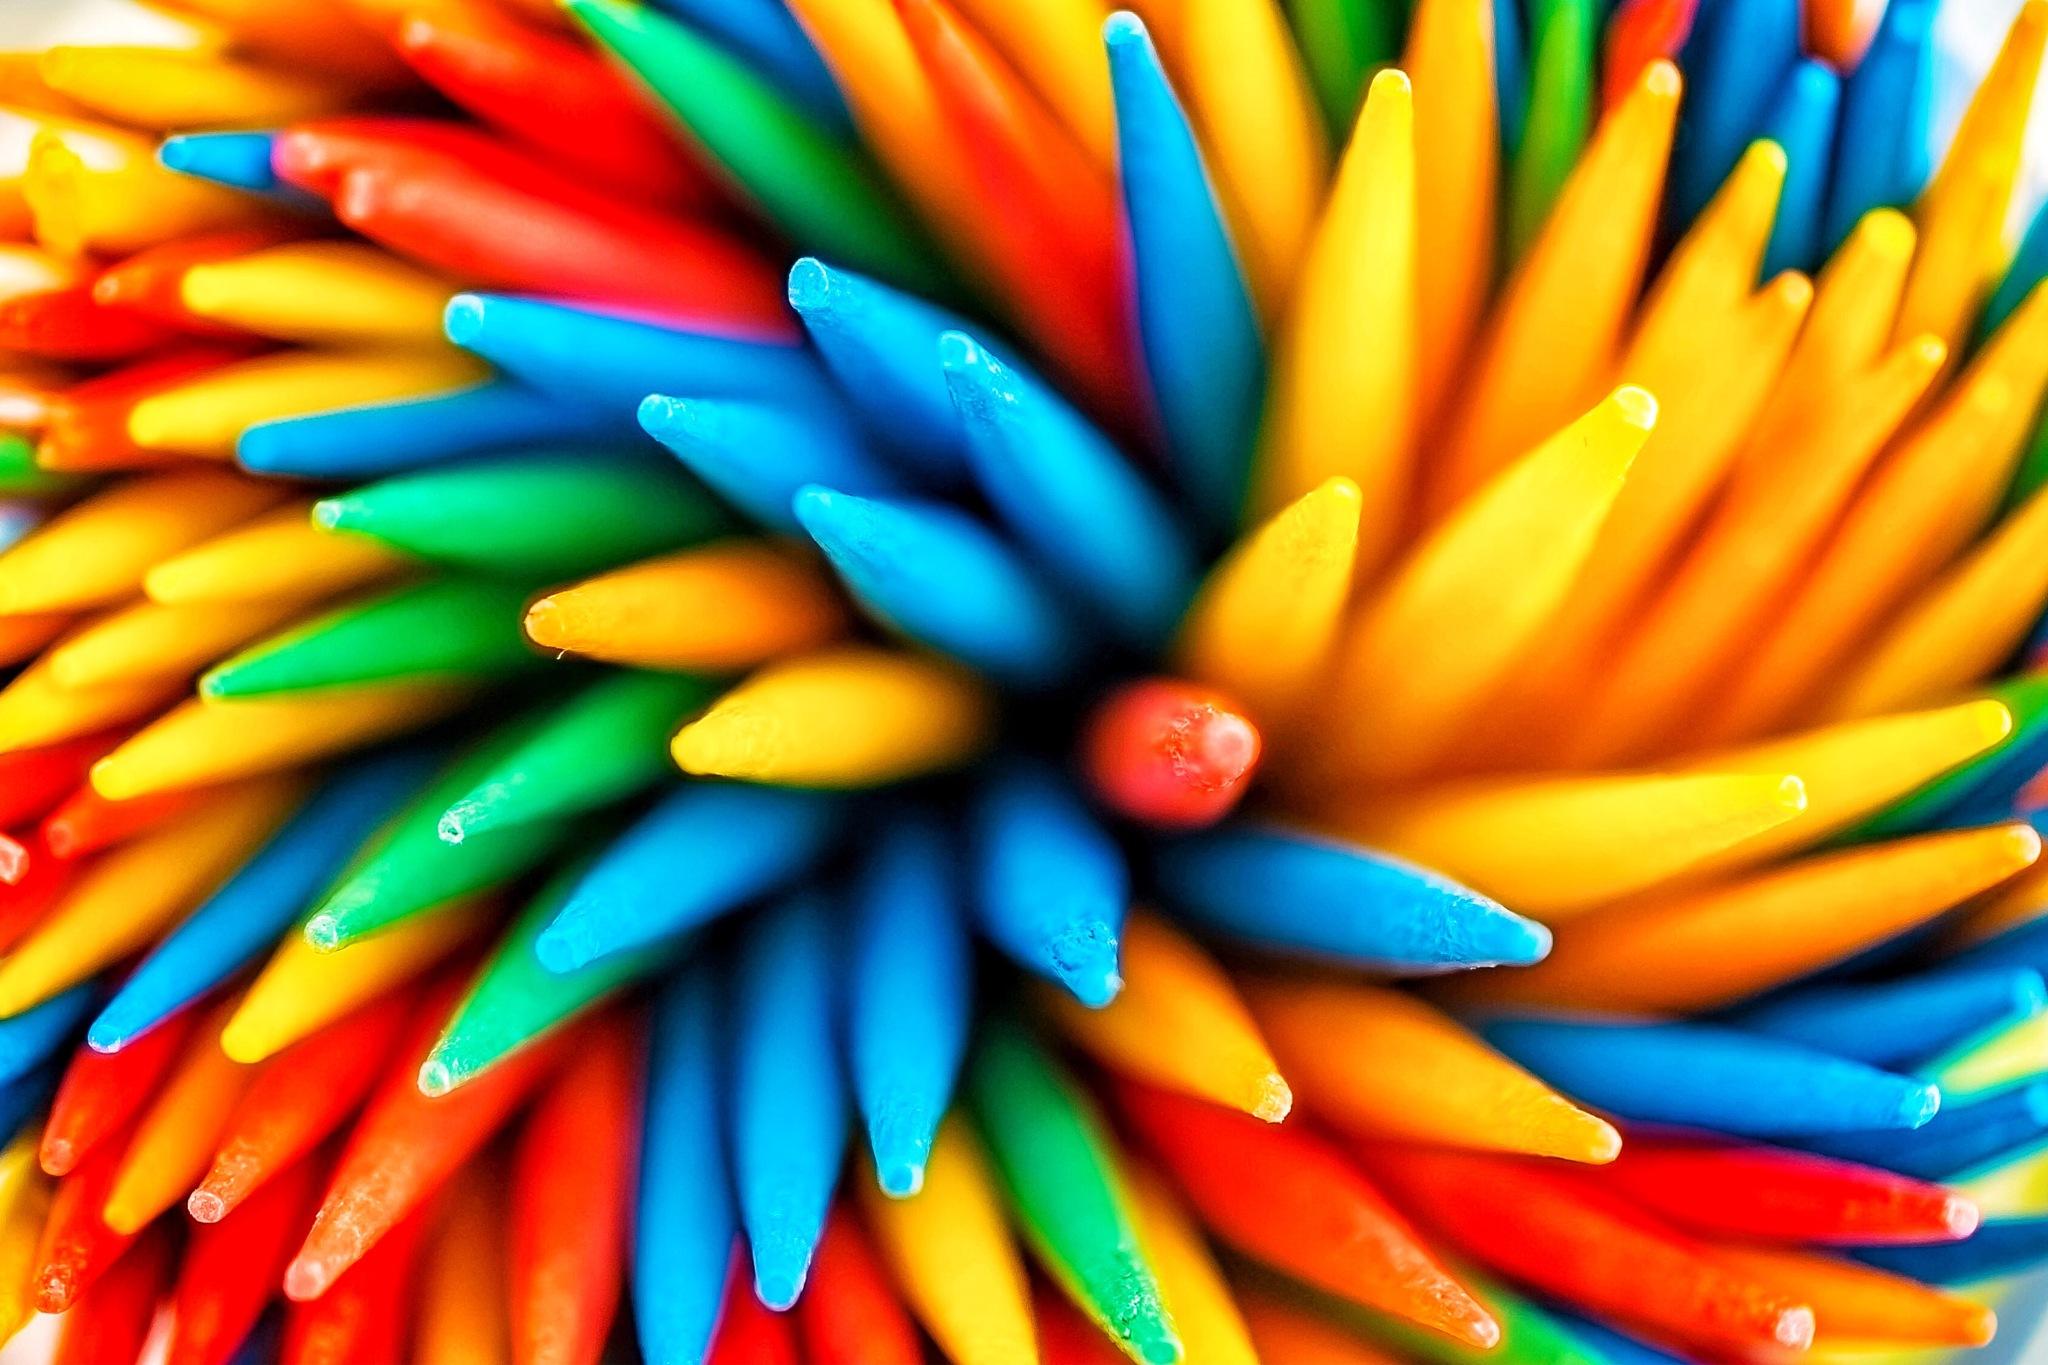 Rainbow Picks by Hoffler Pictorials